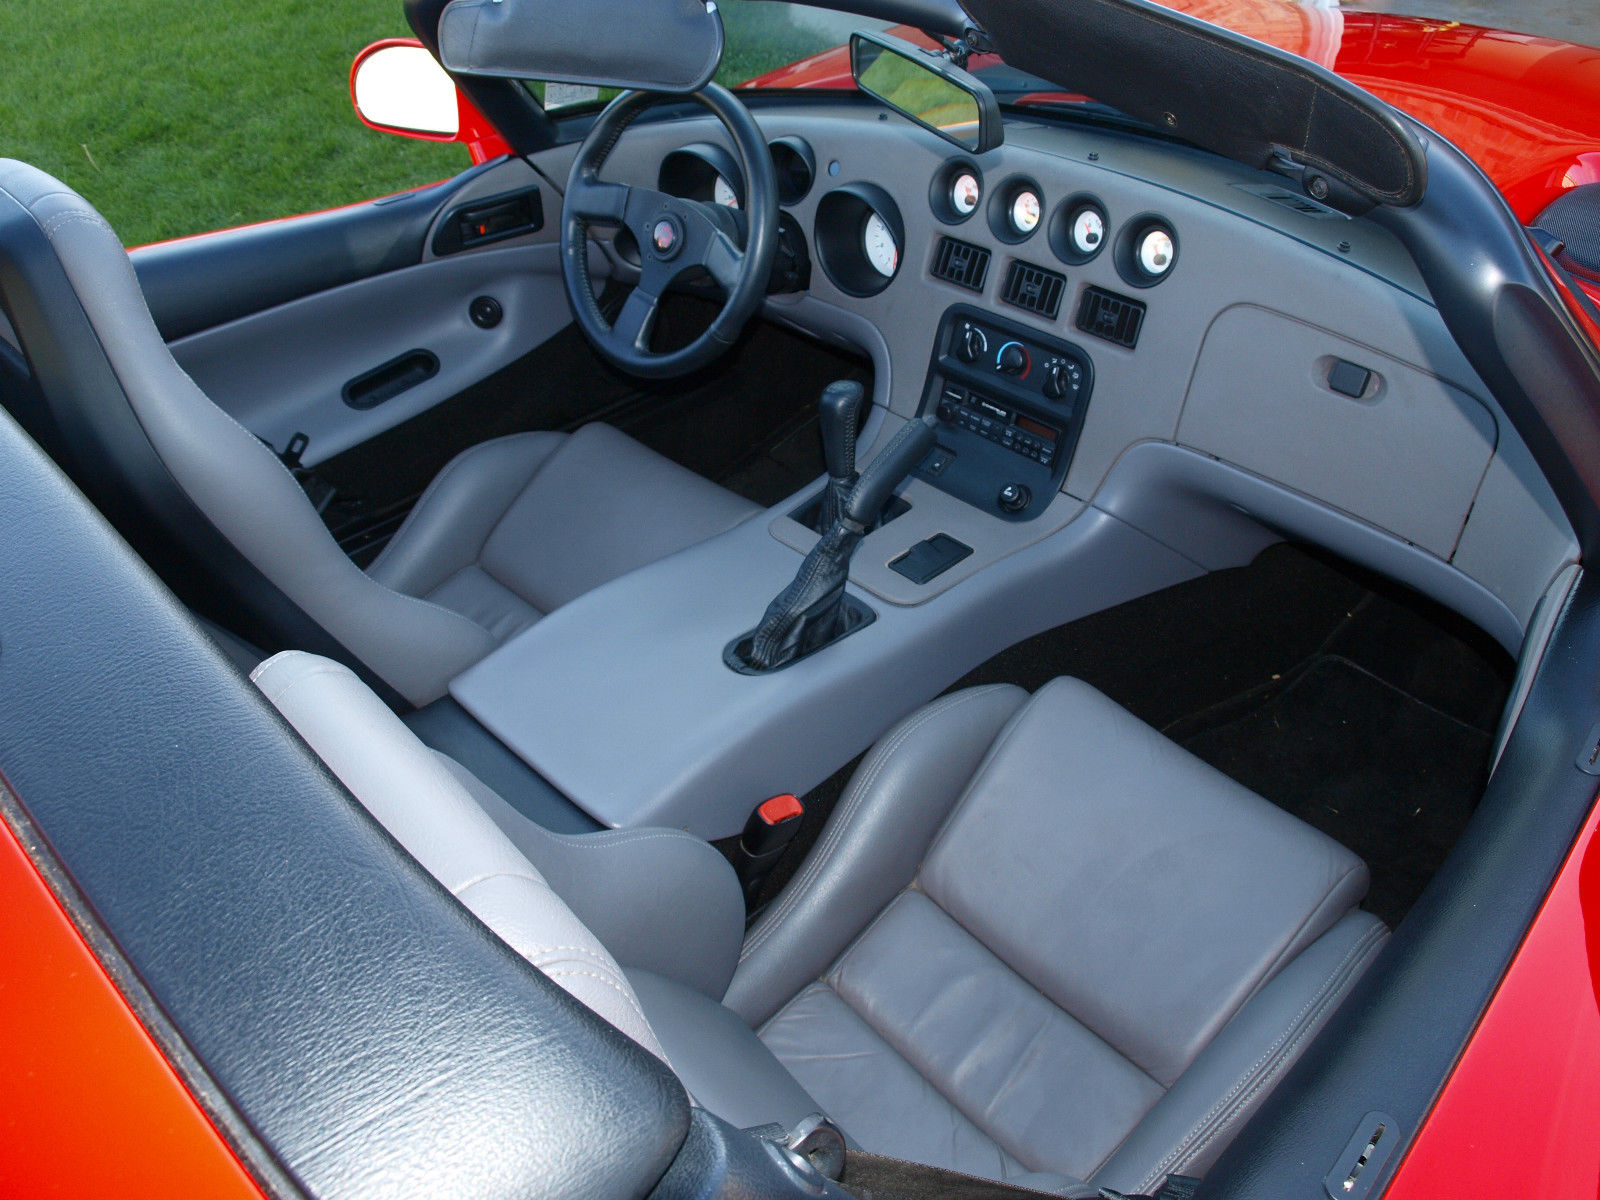 Dodge Viper For Sale >> 1994 Viper with 504 Miles on eBay | Mopar Blog